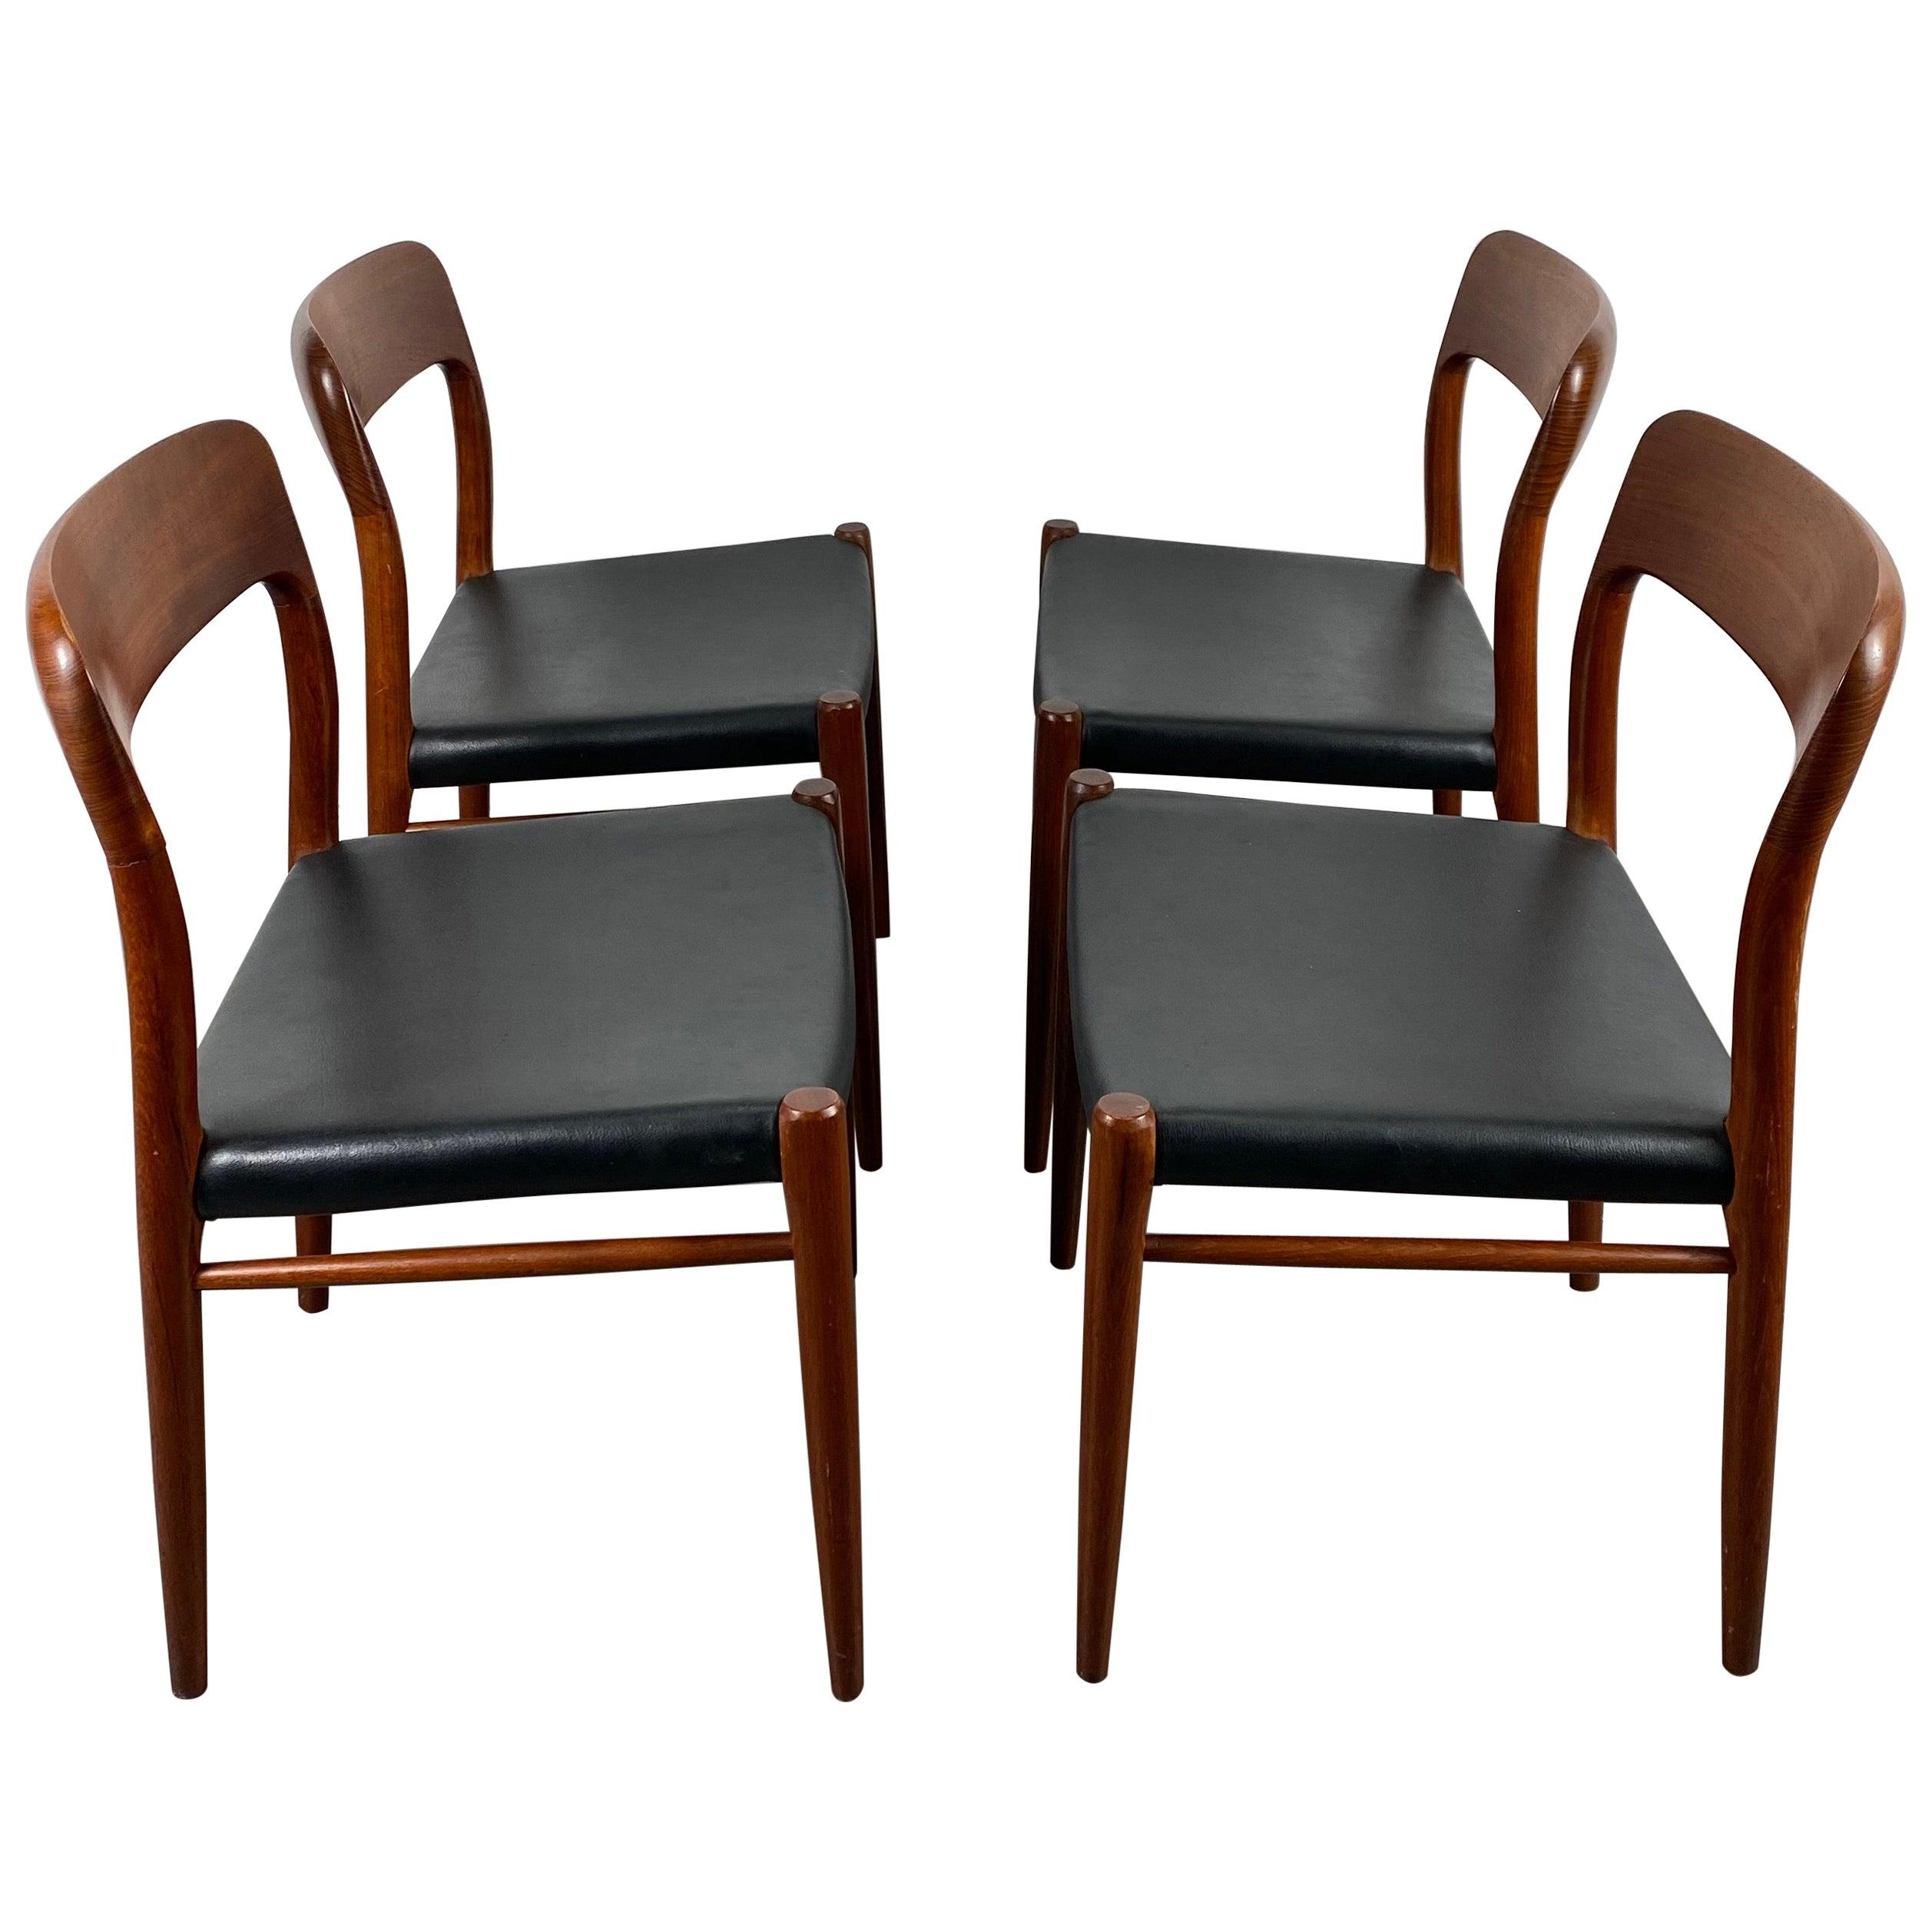 Niels Möller Modell 75 Danish Teak Dining Leather Chair for J.L. Möllers